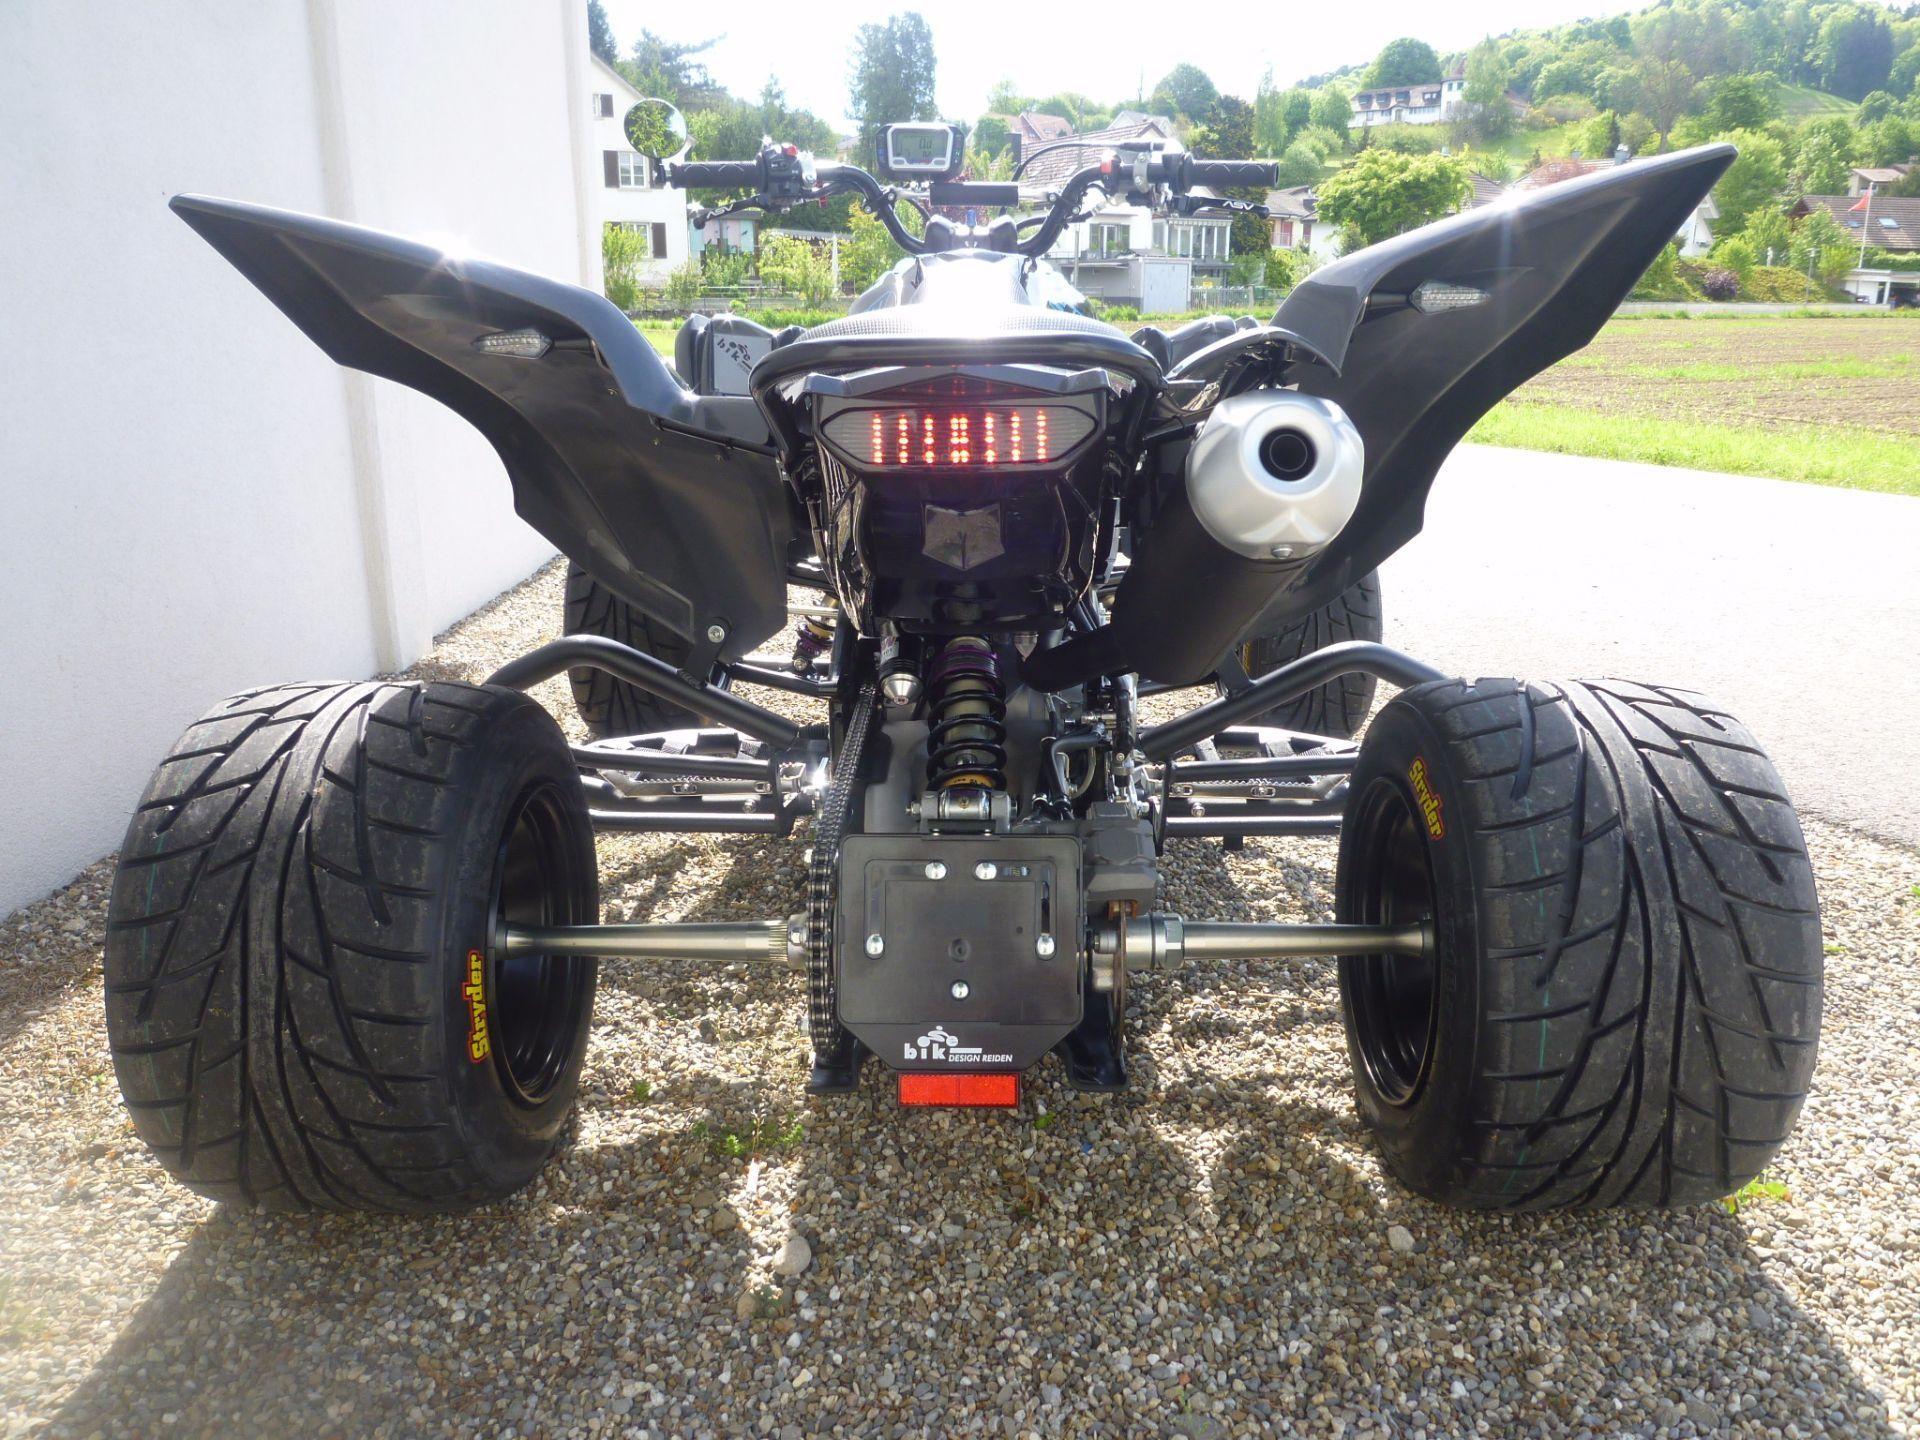 motorrad occasion kaufen yamaha quad yfm 700 r raptor bike design reiden. Black Bedroom Furniture Sets. Home Design Ideas